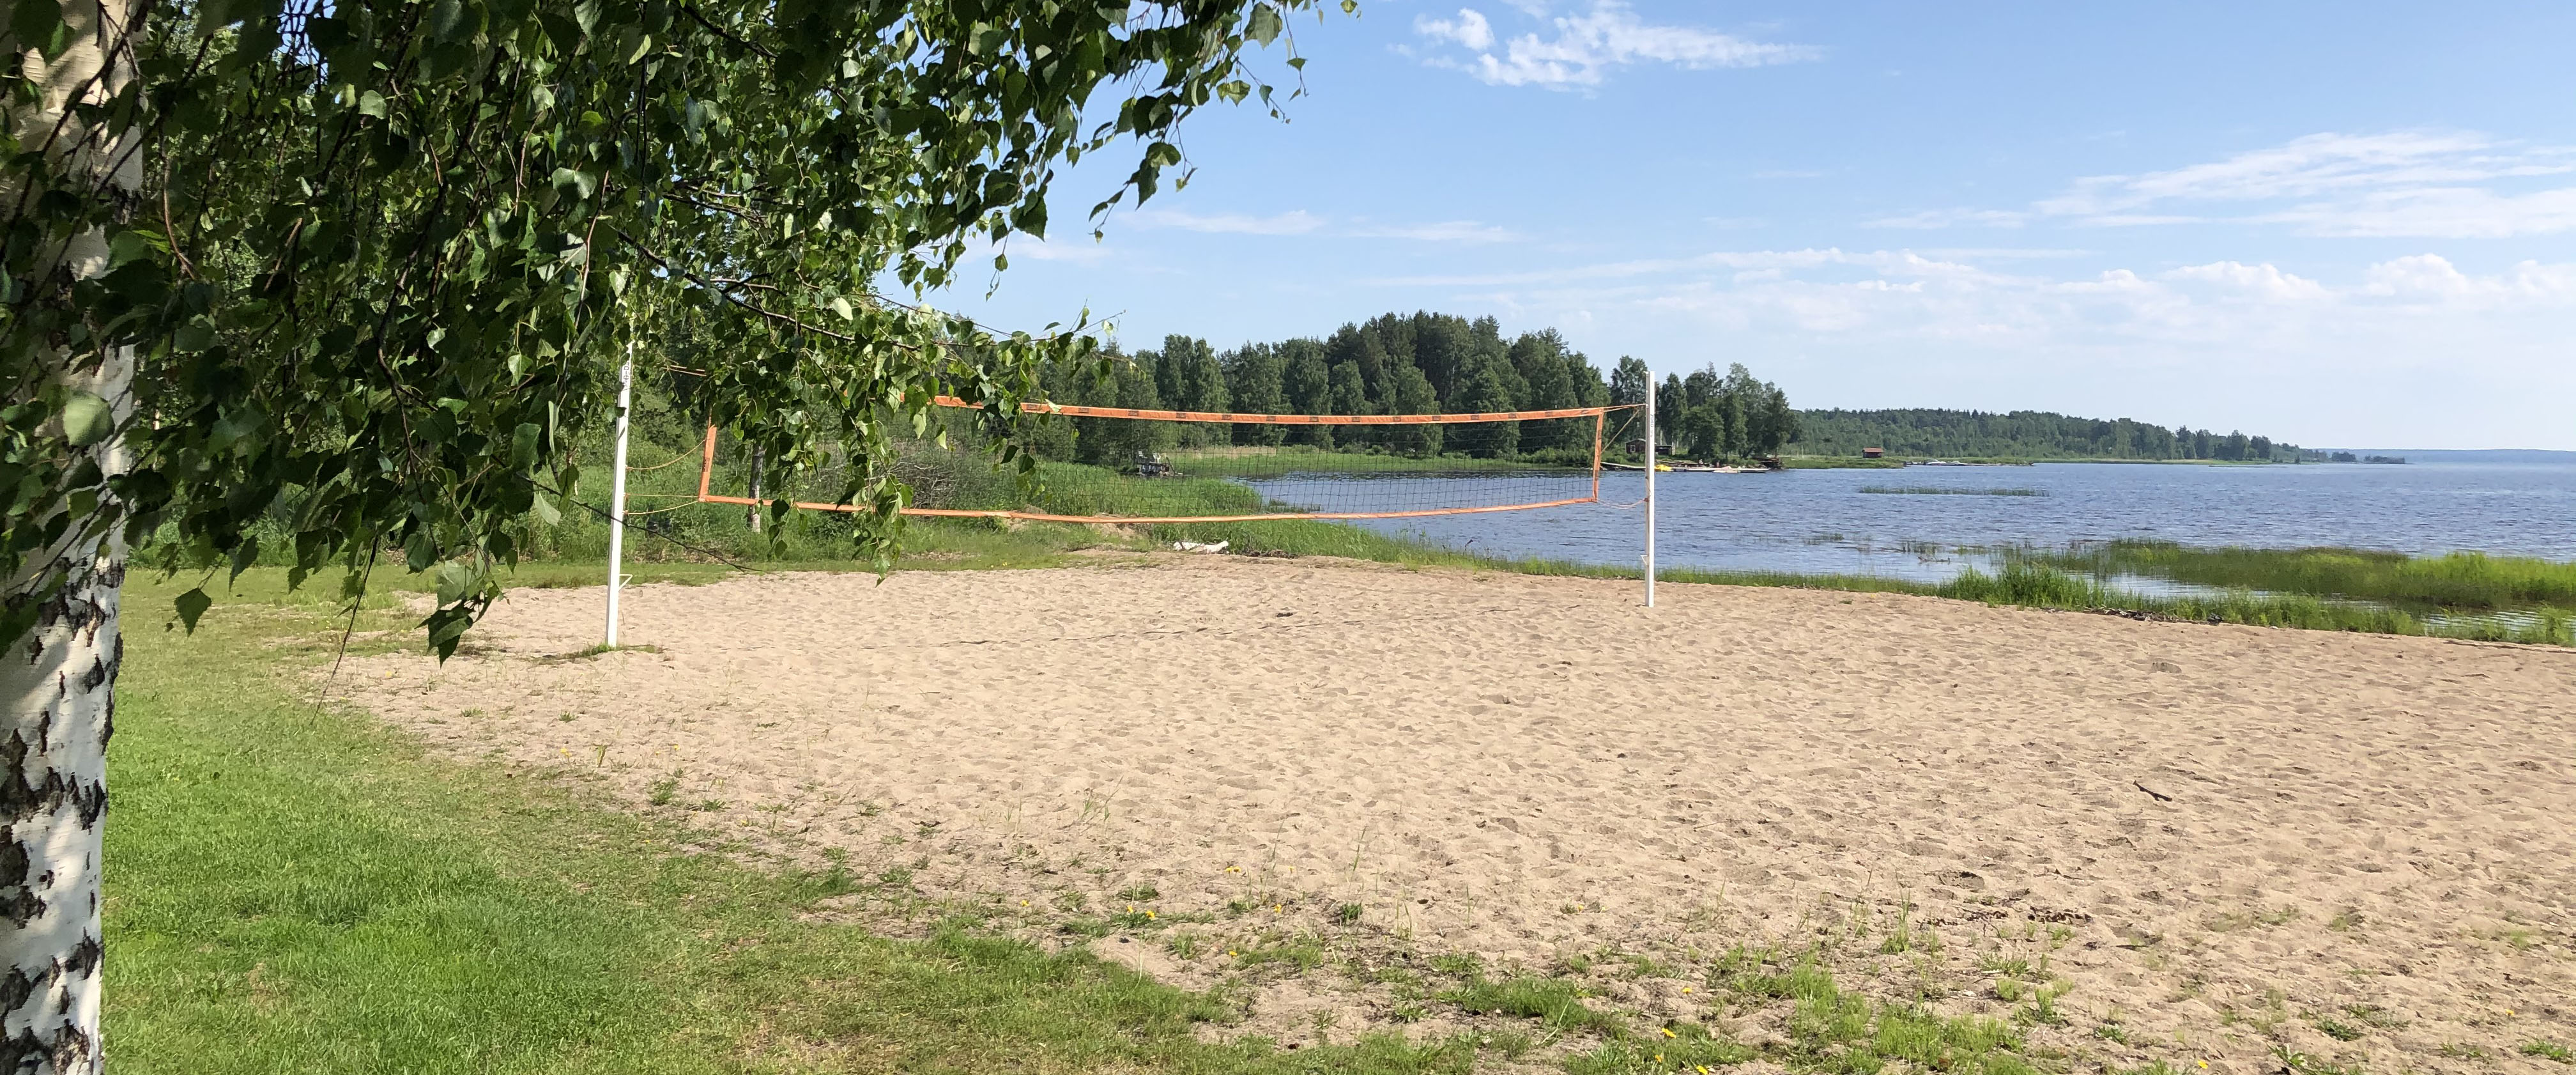 Sandöbadet Beachvolleyboll